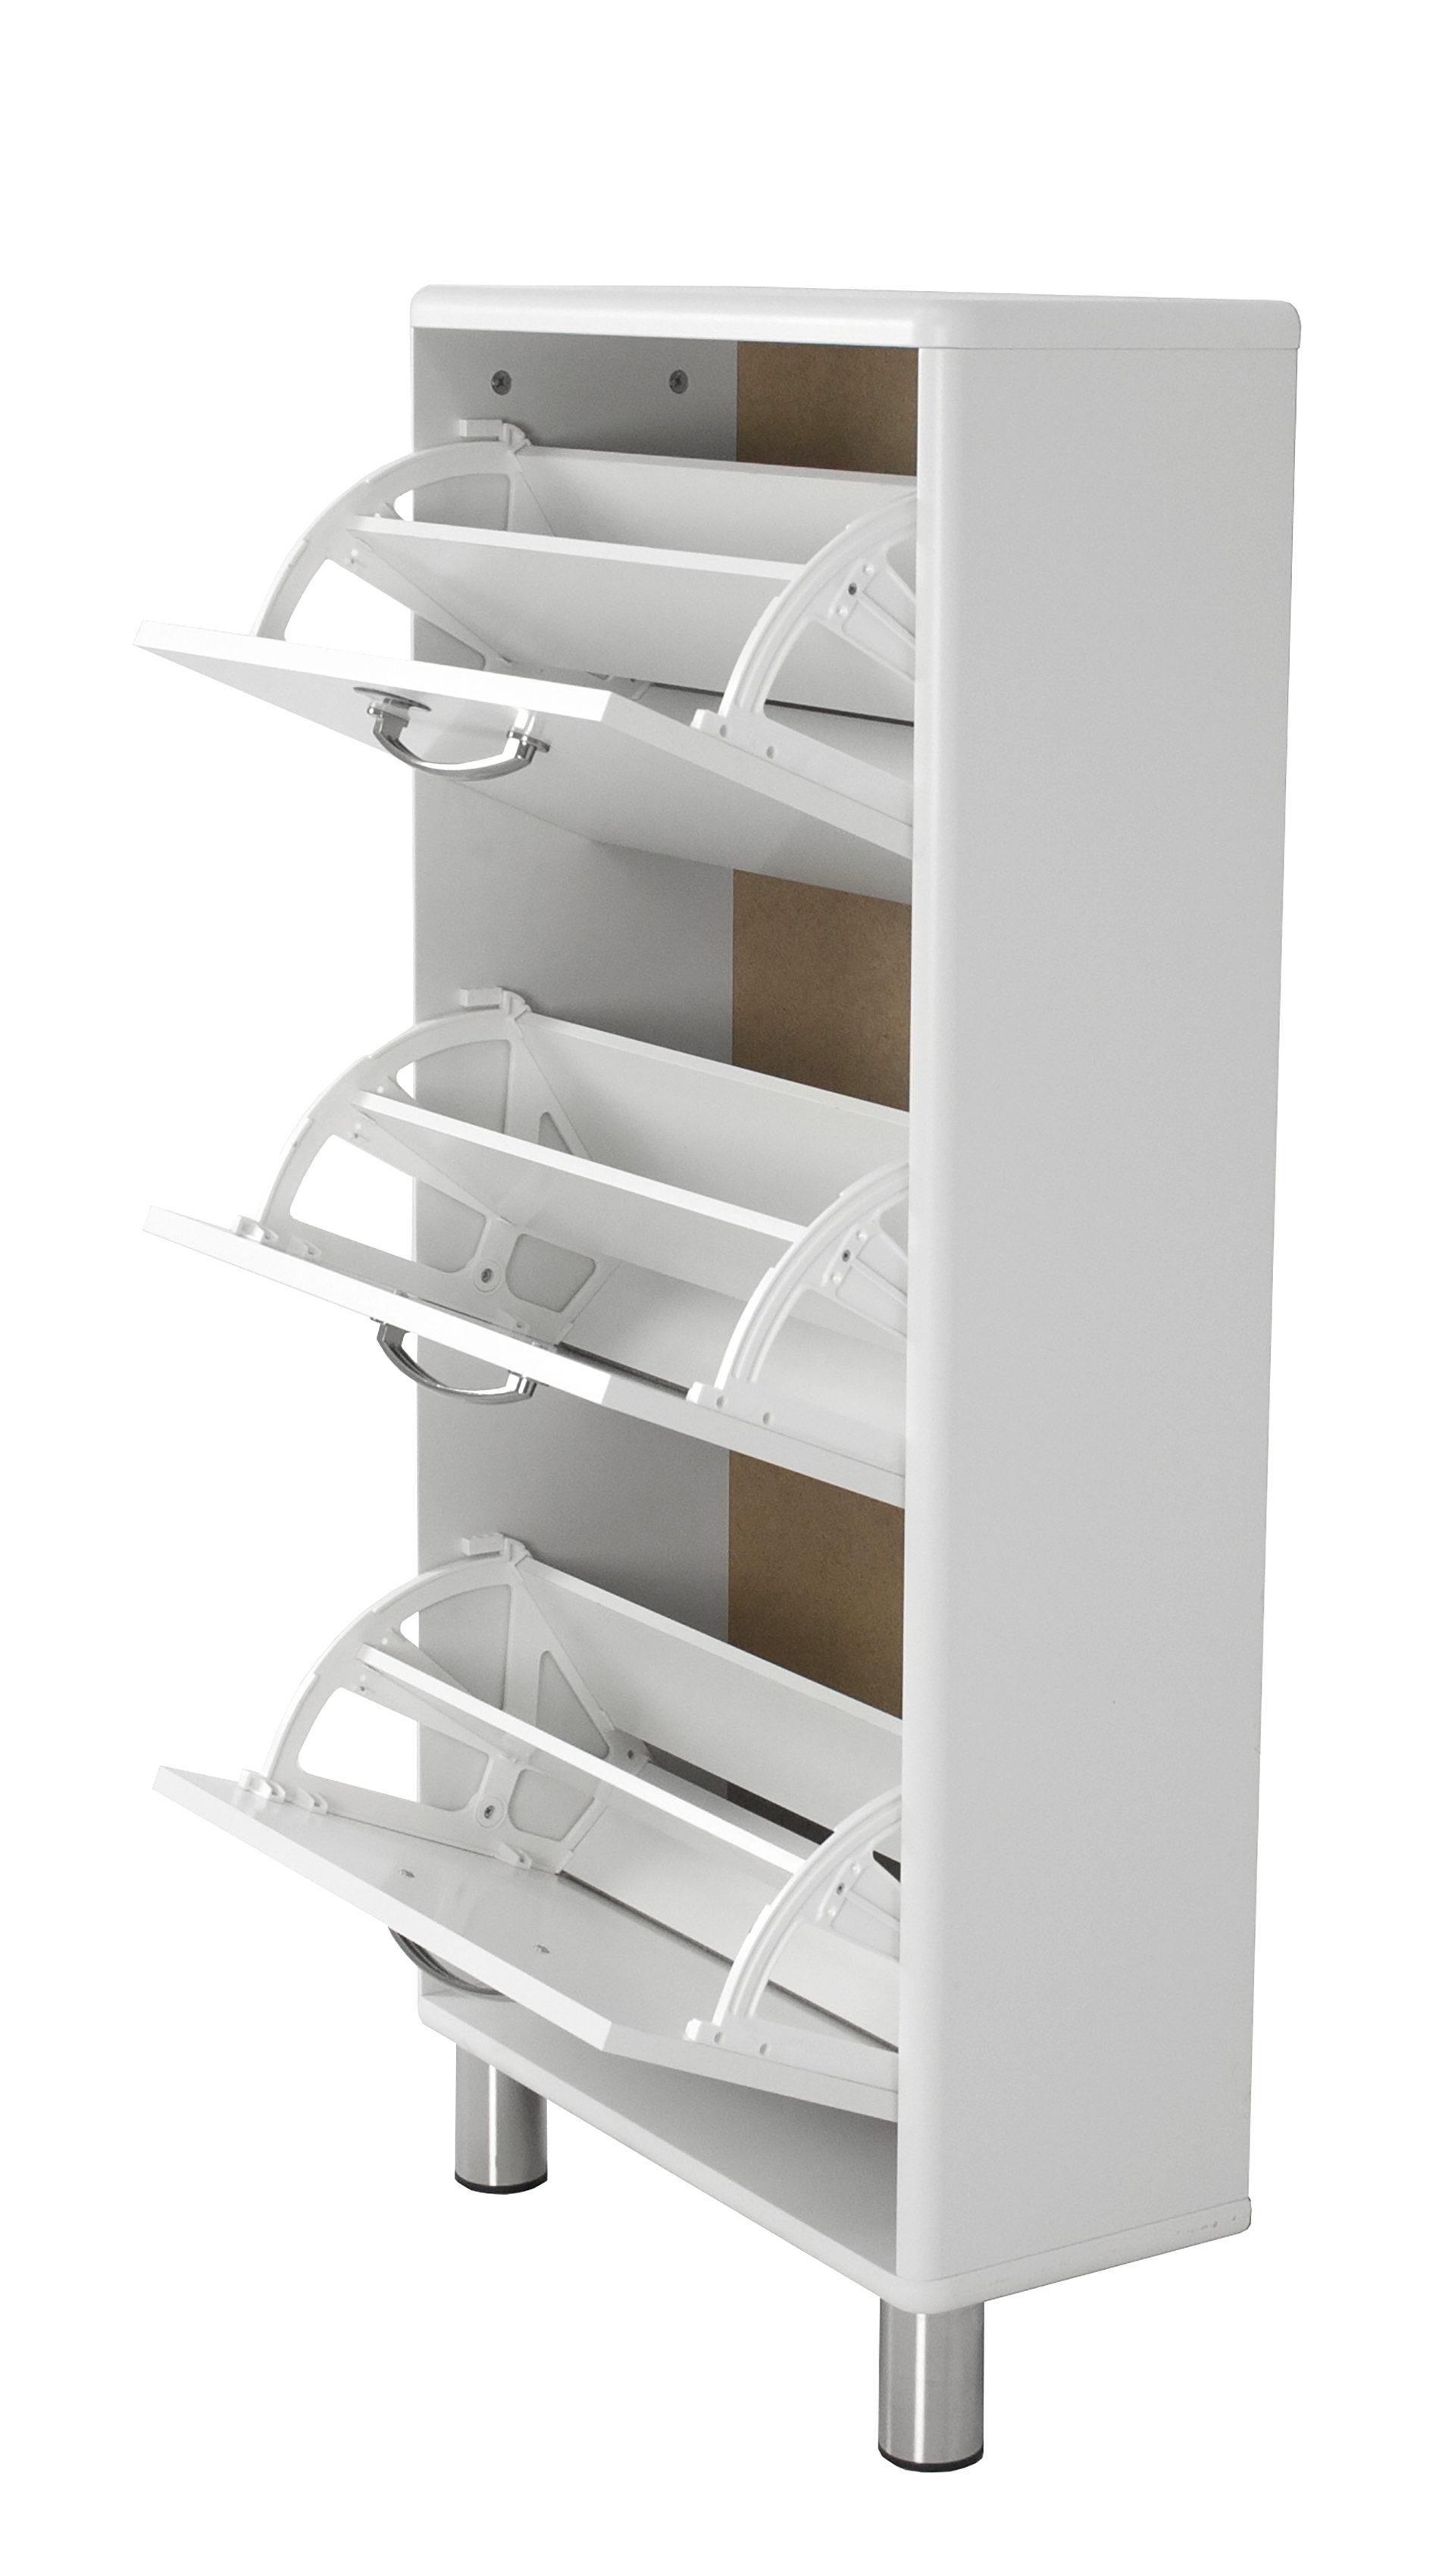 Schuhschrank Malibu Möbel | smartpersoneelsdossier